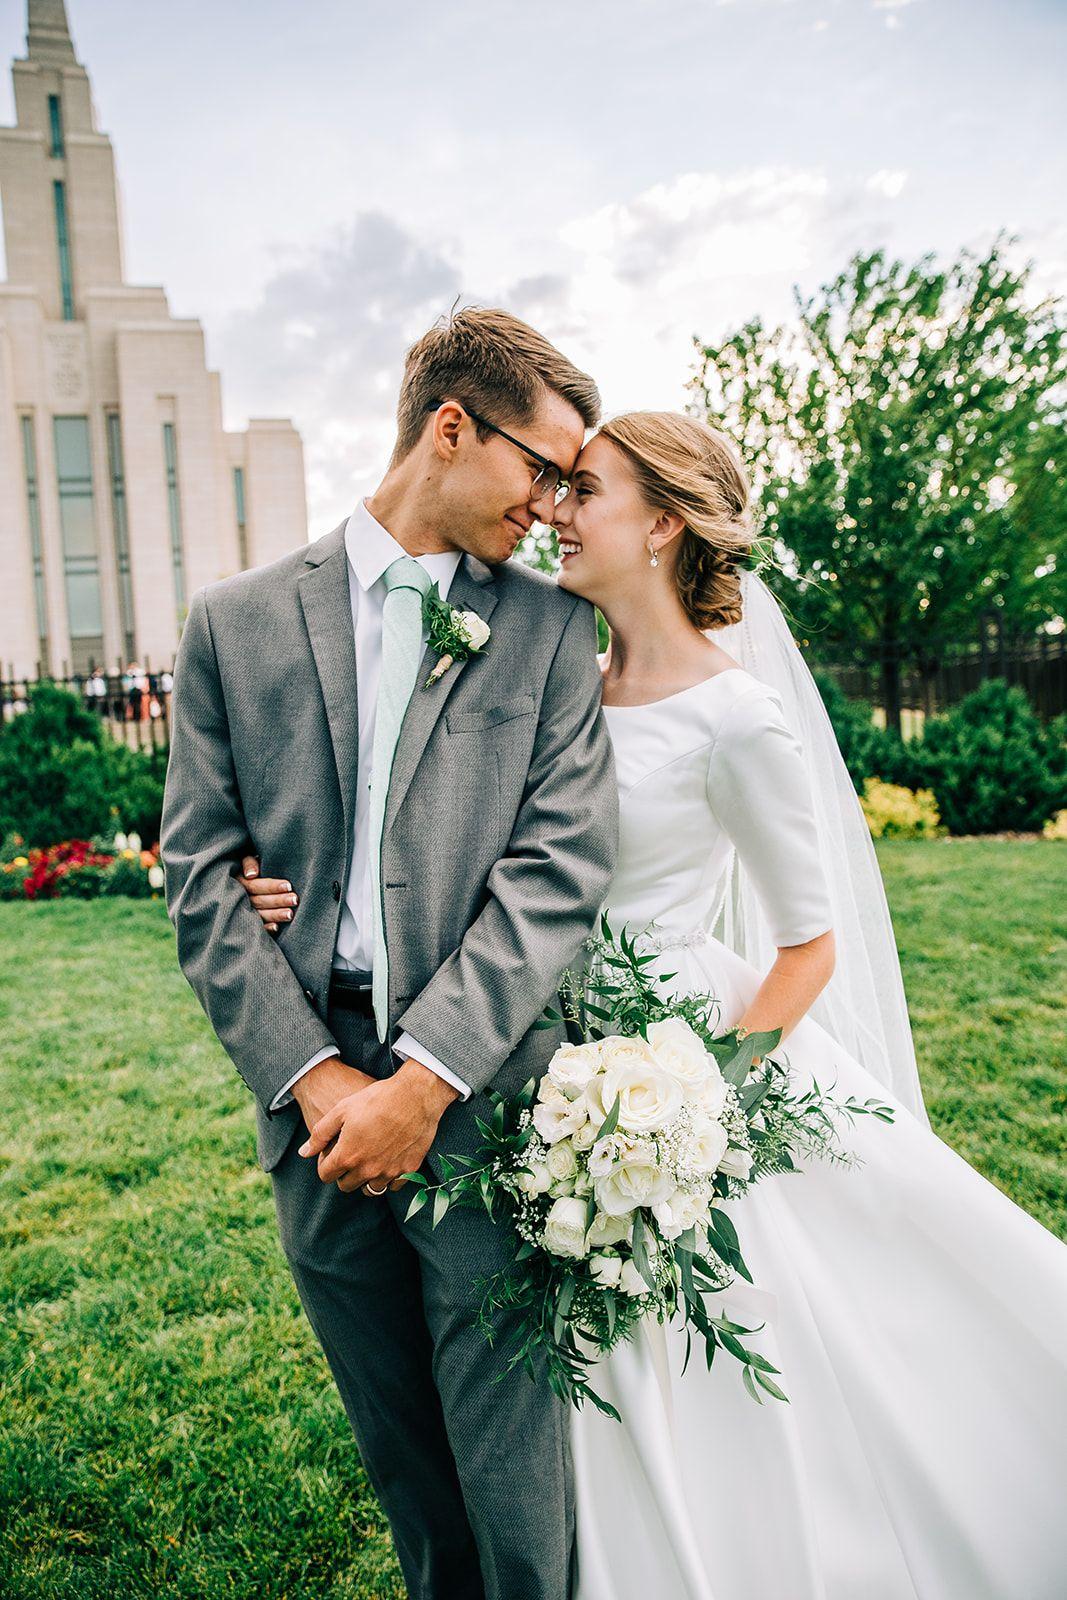 Lds wedding inspo modest dress young couple oquirrh